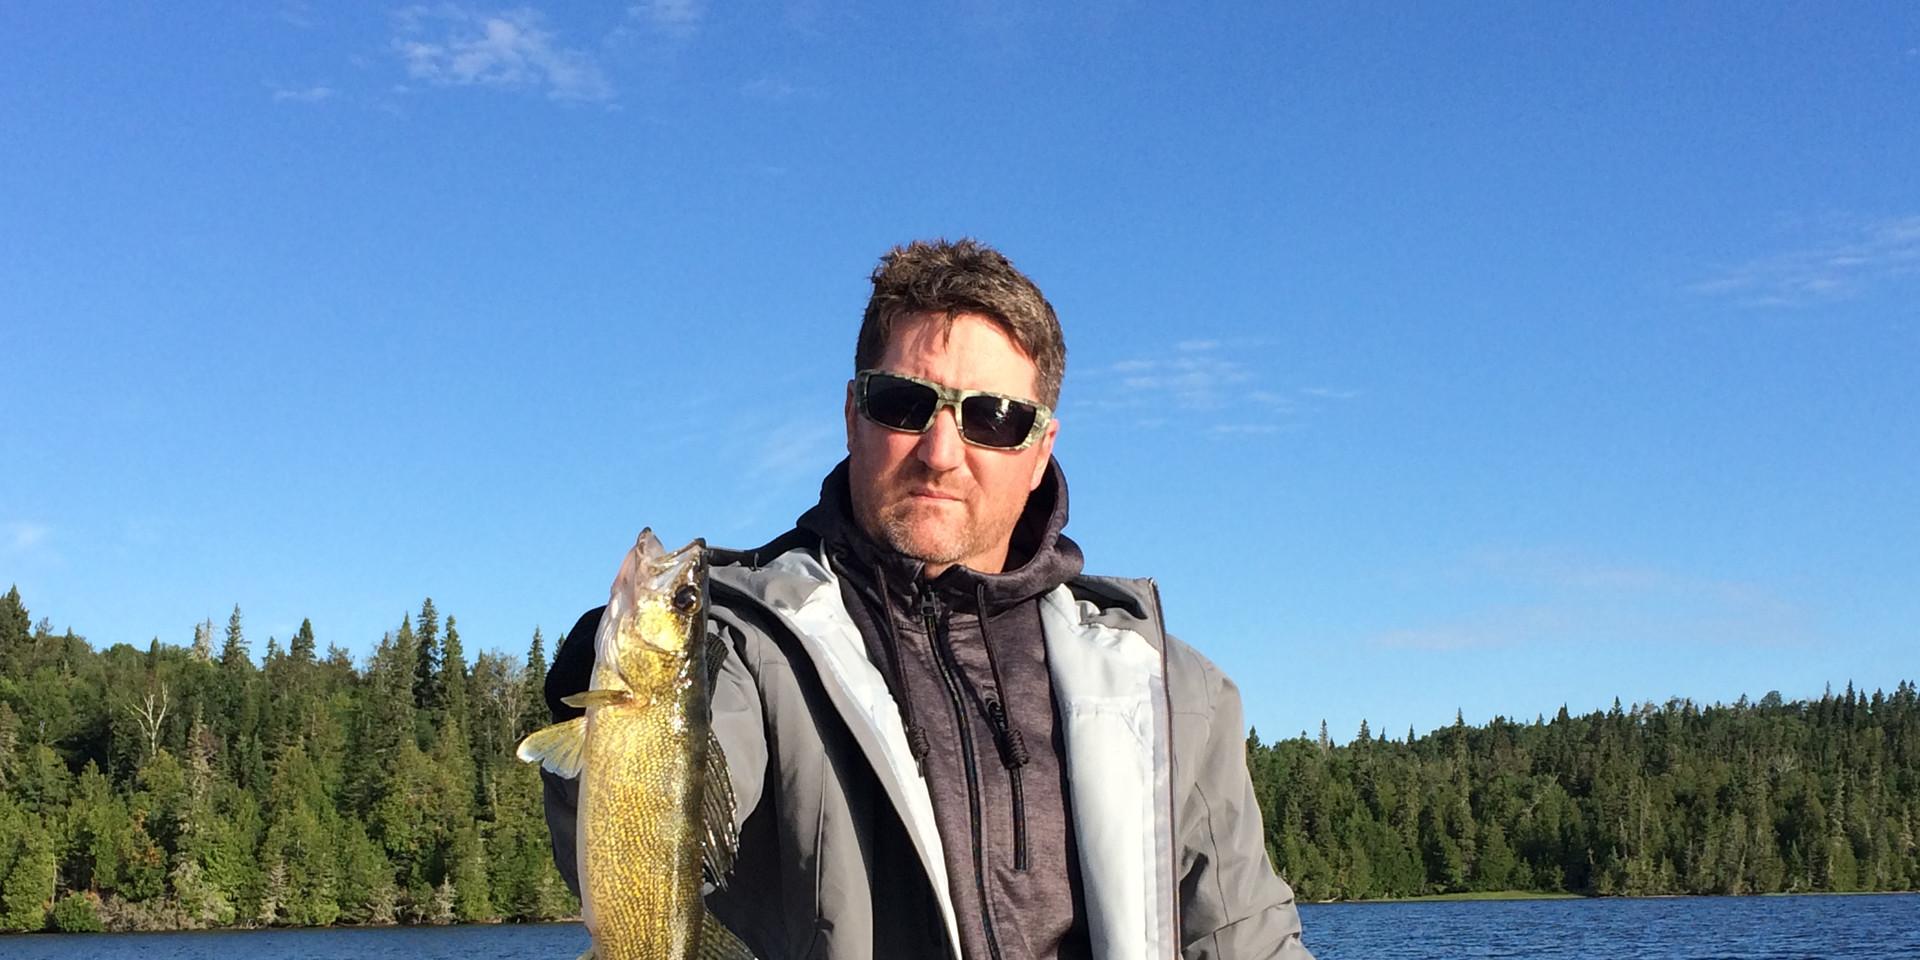 Colin with a walleye on Shekak Lake